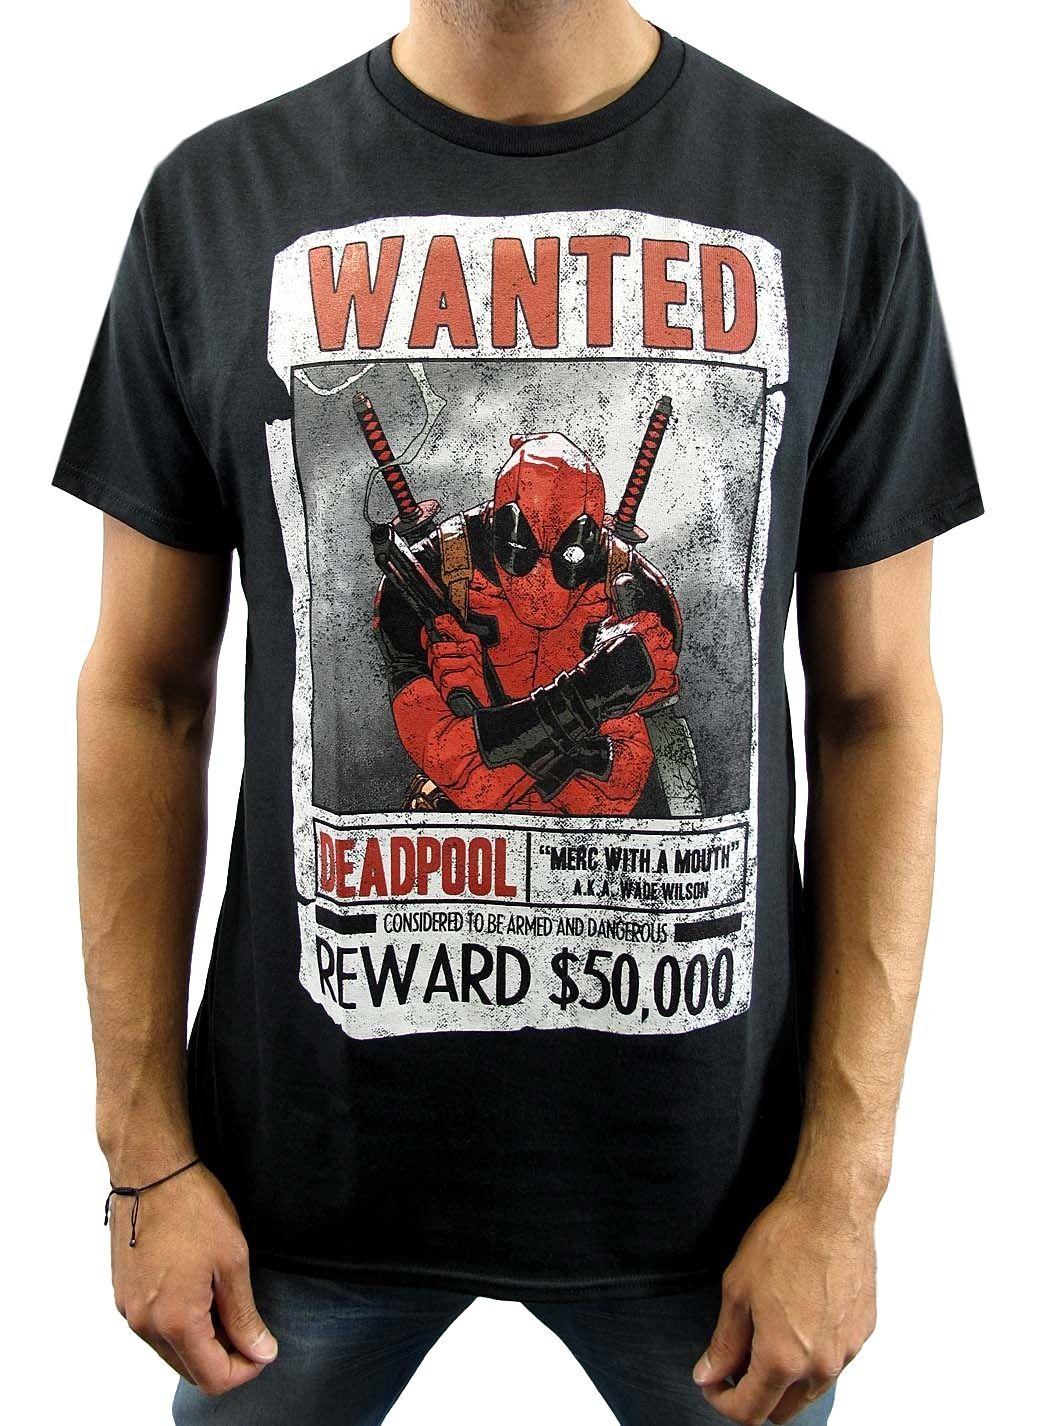 aed288fb944 Marvel Мужская Deadpool Wanted Armed and Dangerous черная футболка Новая  летняя хлопковая футболка с короткими рукавами